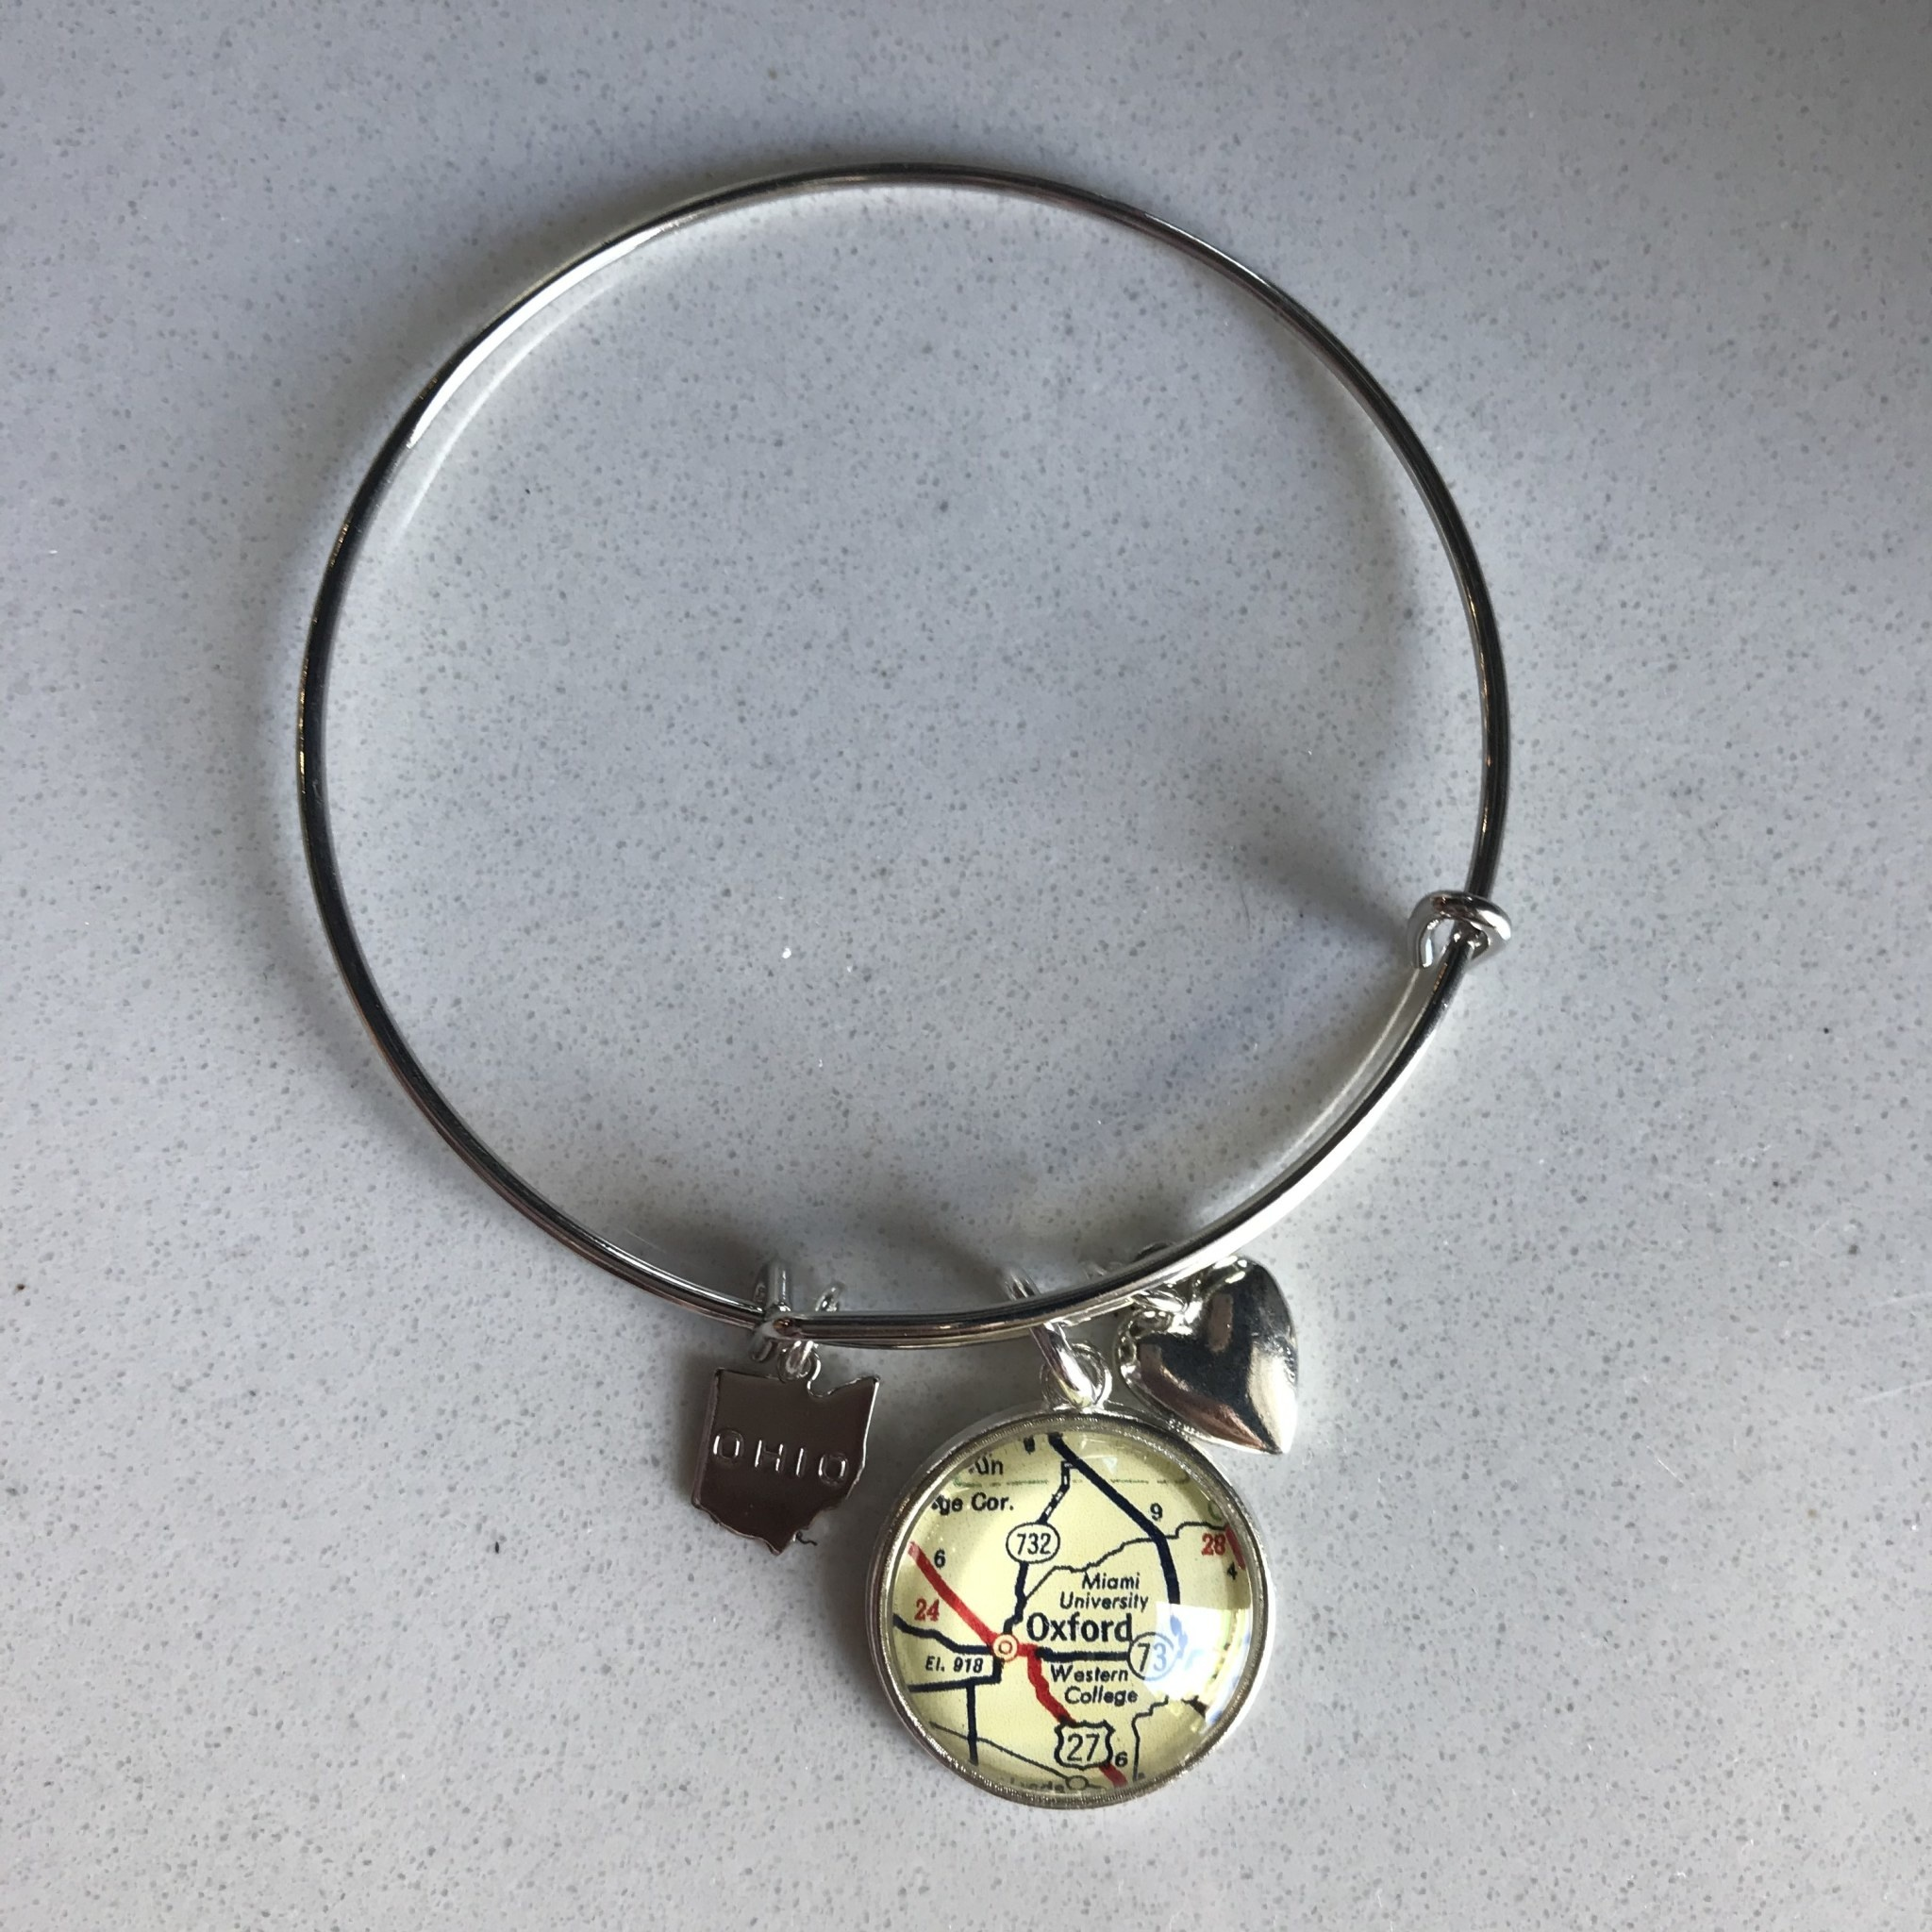 Fleurish Home Vintage Map Charm Bracelet -Brass Oxford/ Miami University